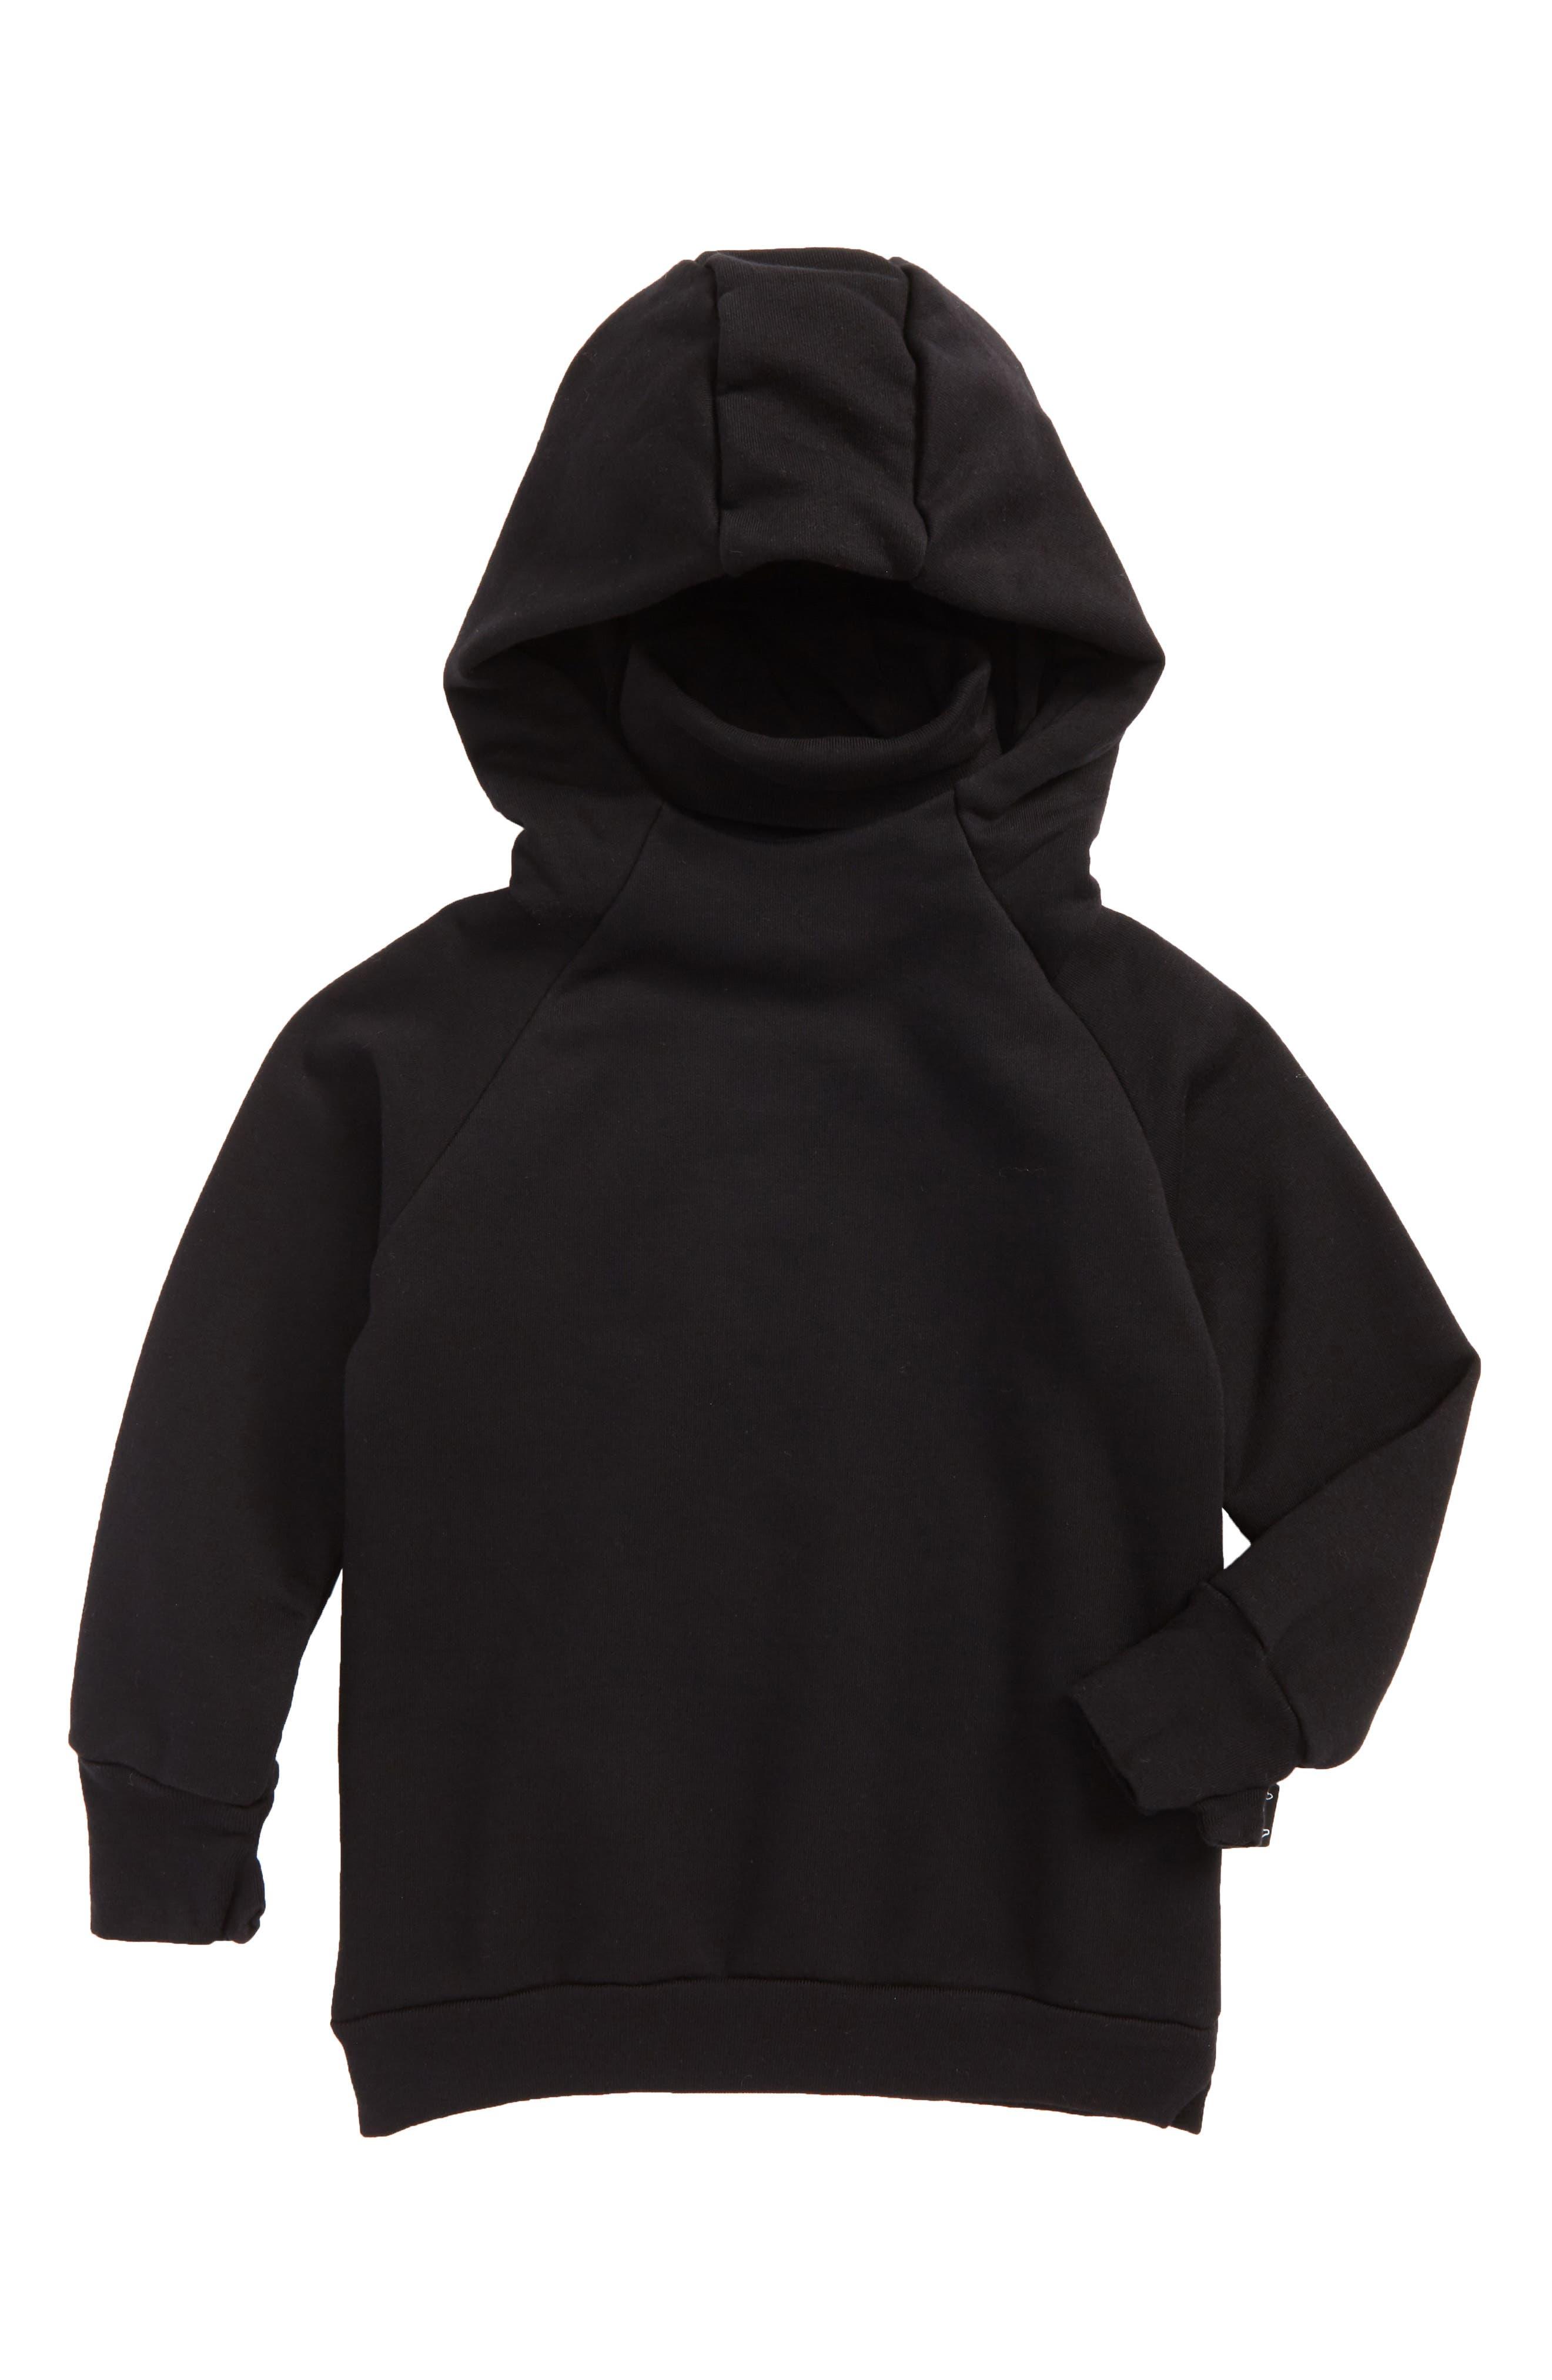 Ninja Hoodie,                             Main thumbnail 1, color,                             Black